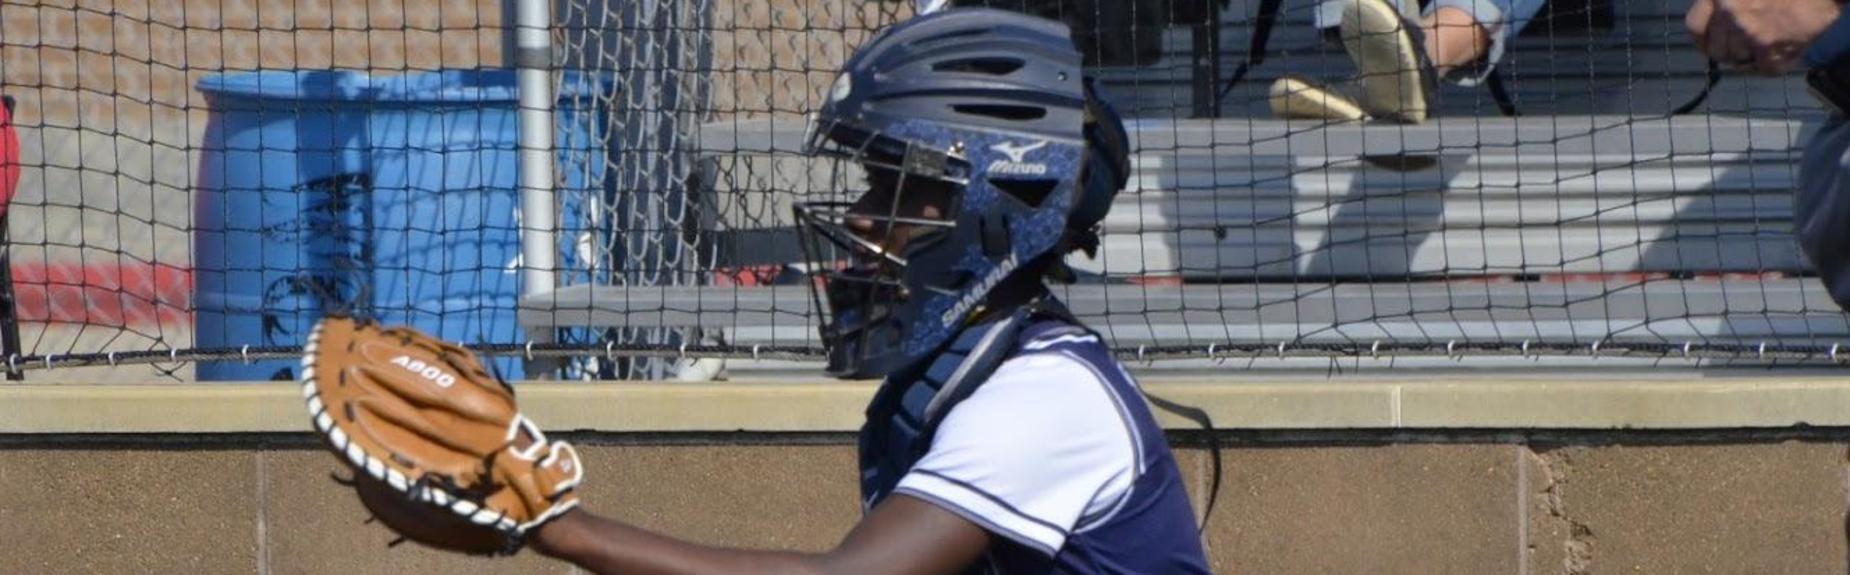 Girls Softball catcher